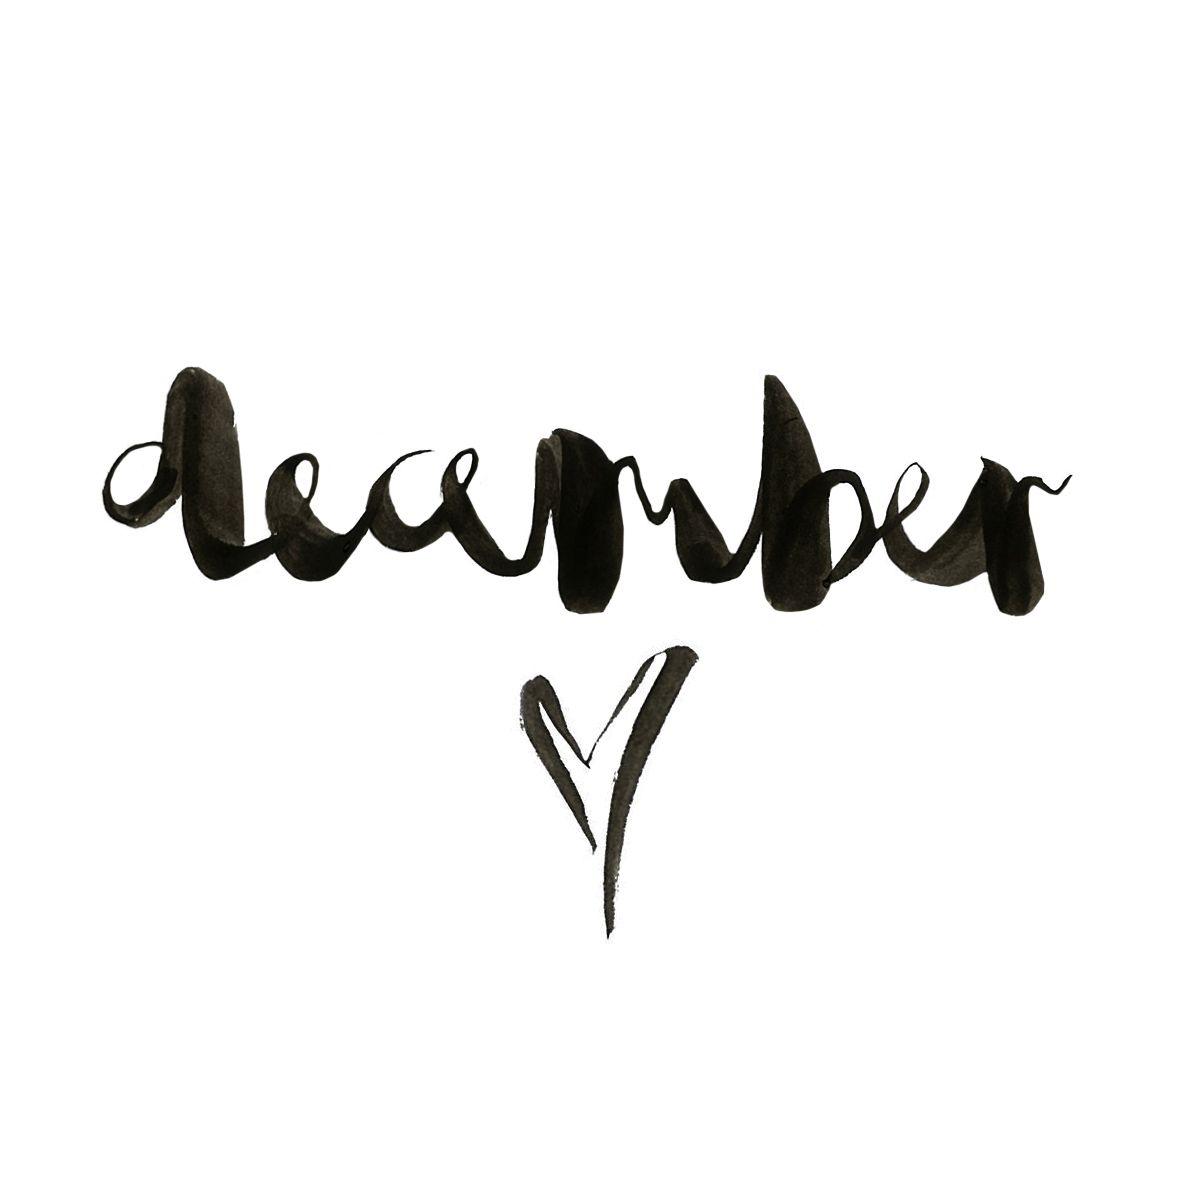 December! | December quotes